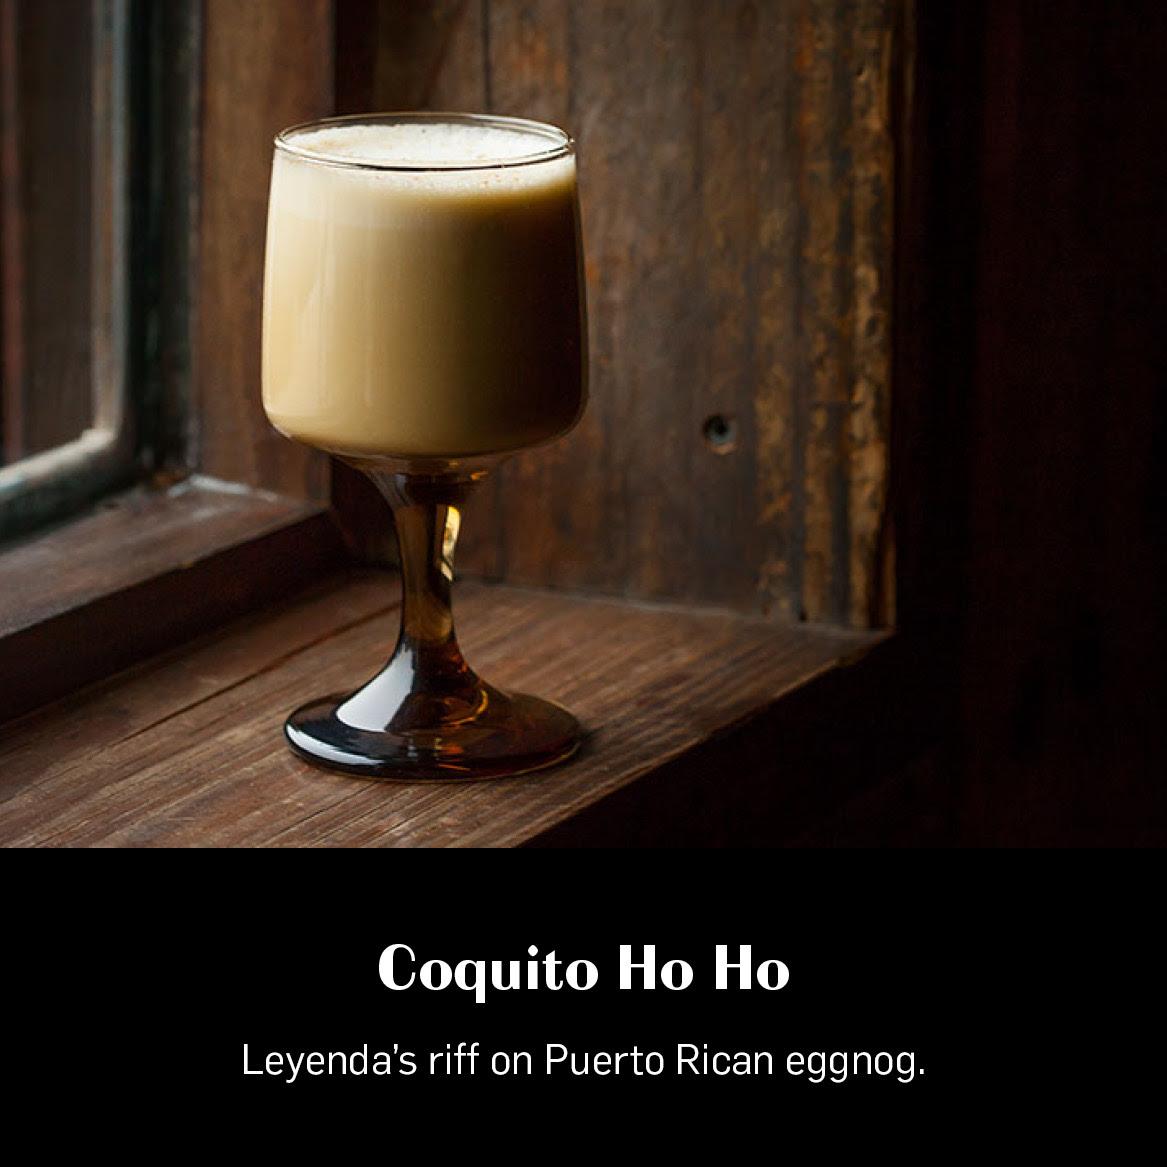 Coquito Ho Ho